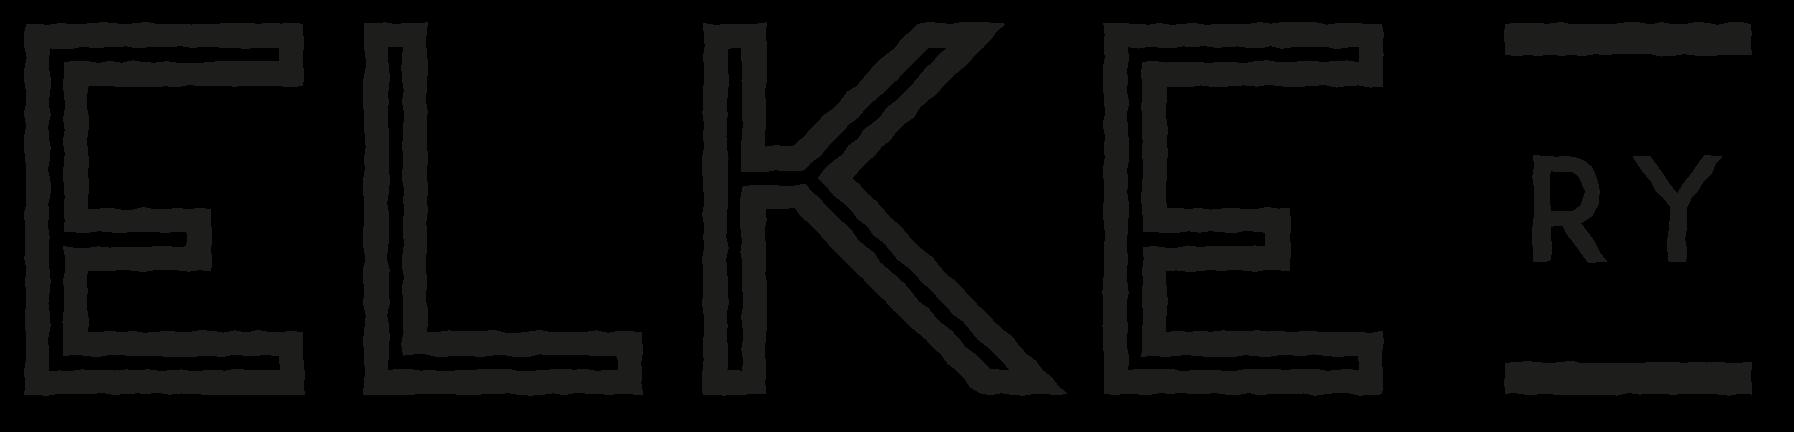 Elke ry:n logo.